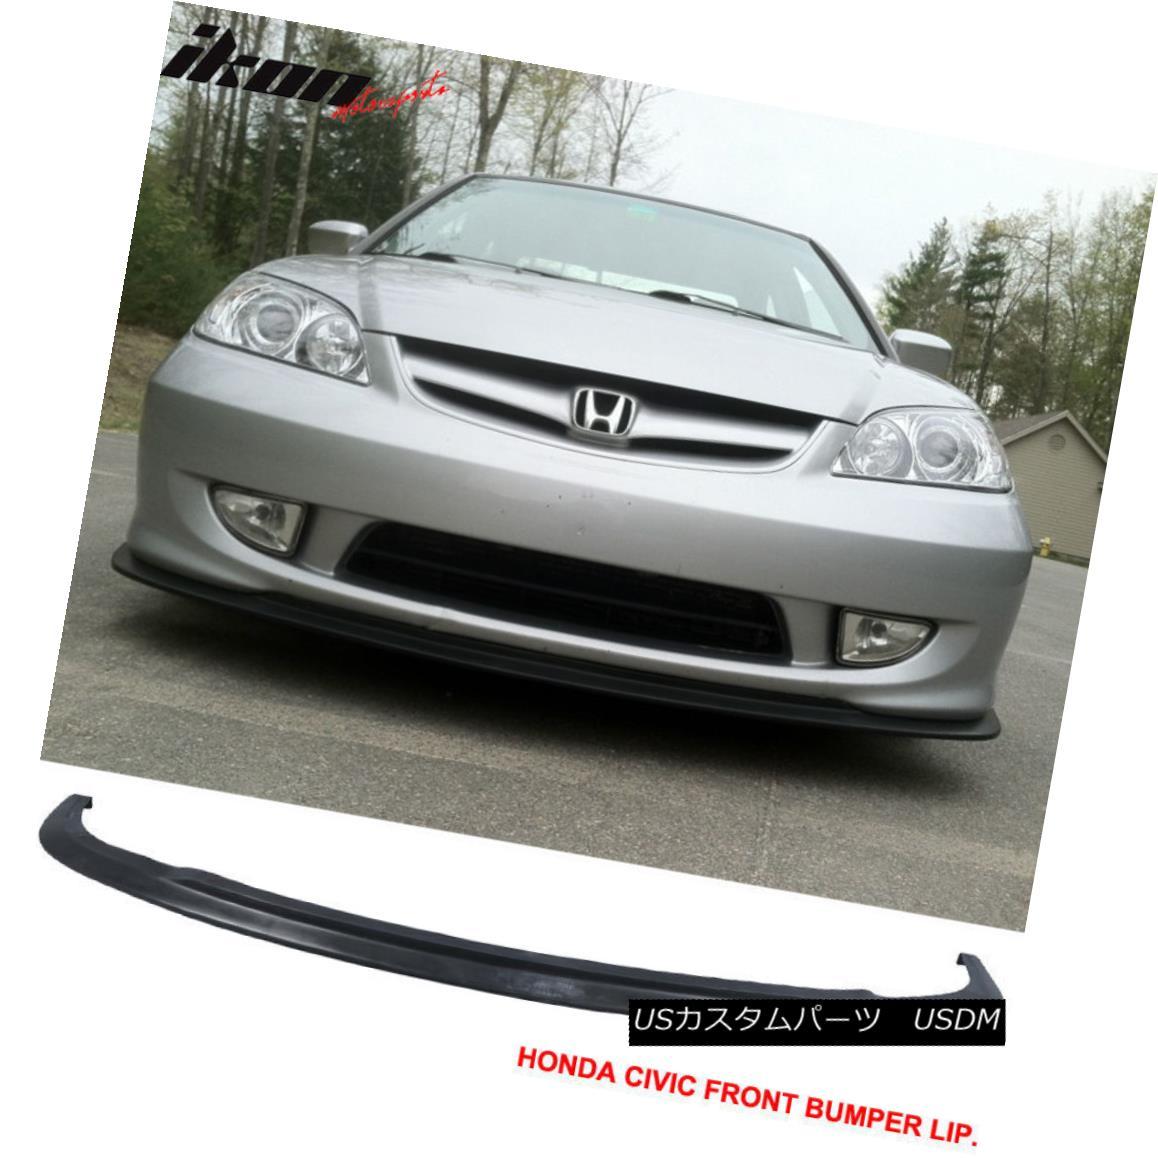 Mugen Front Hood Grill Rear Bumper Lip Fits 96-98 Civic 2Dr//4Dr MU Front